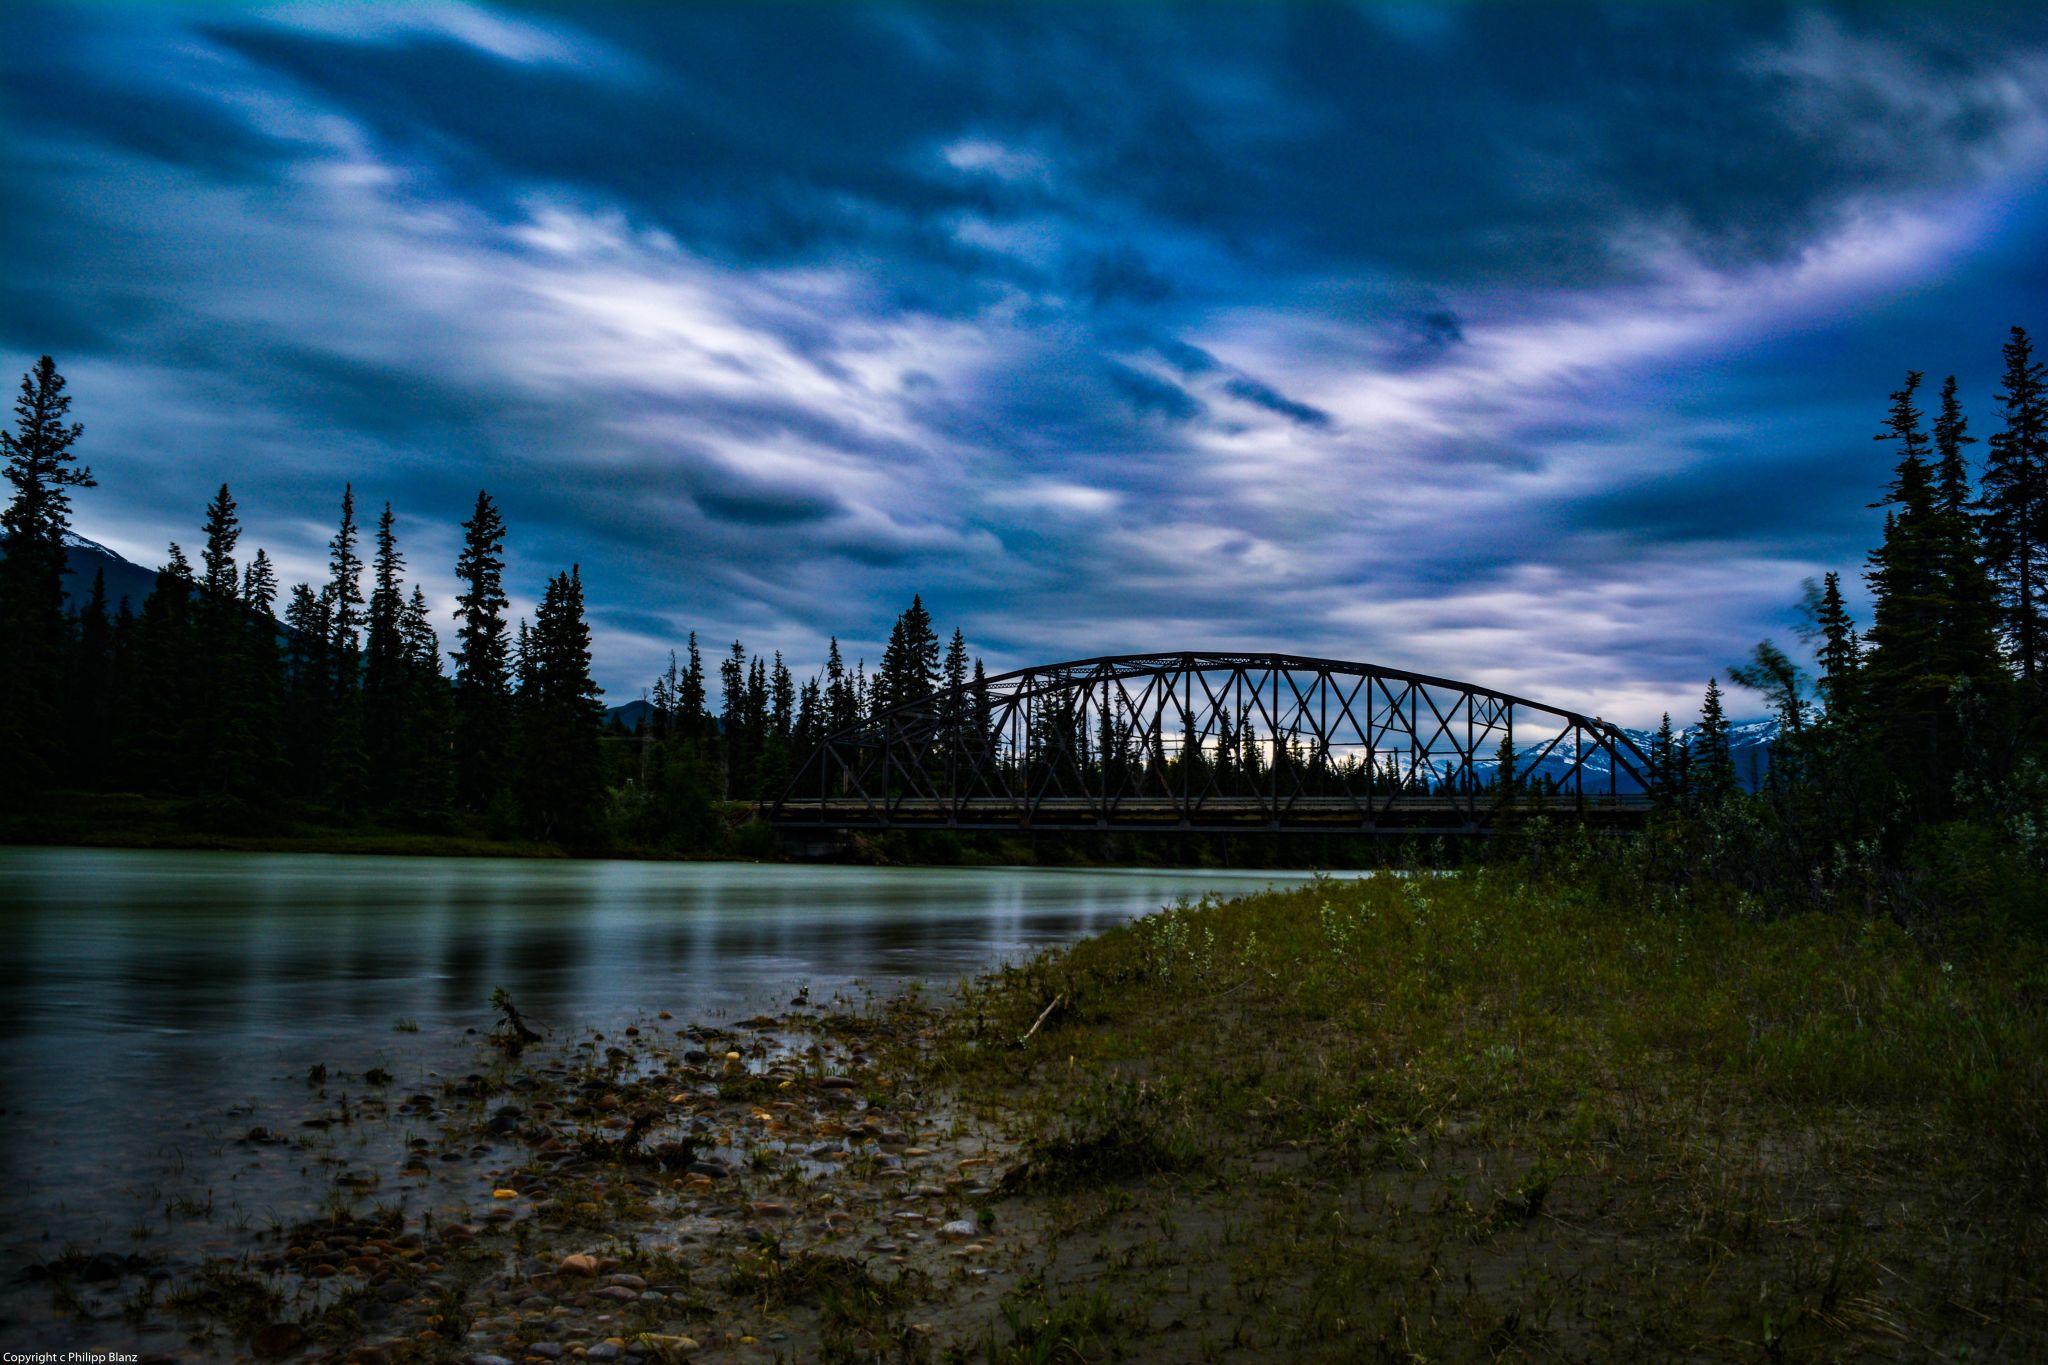 Maligne Lake Bridge, Canada